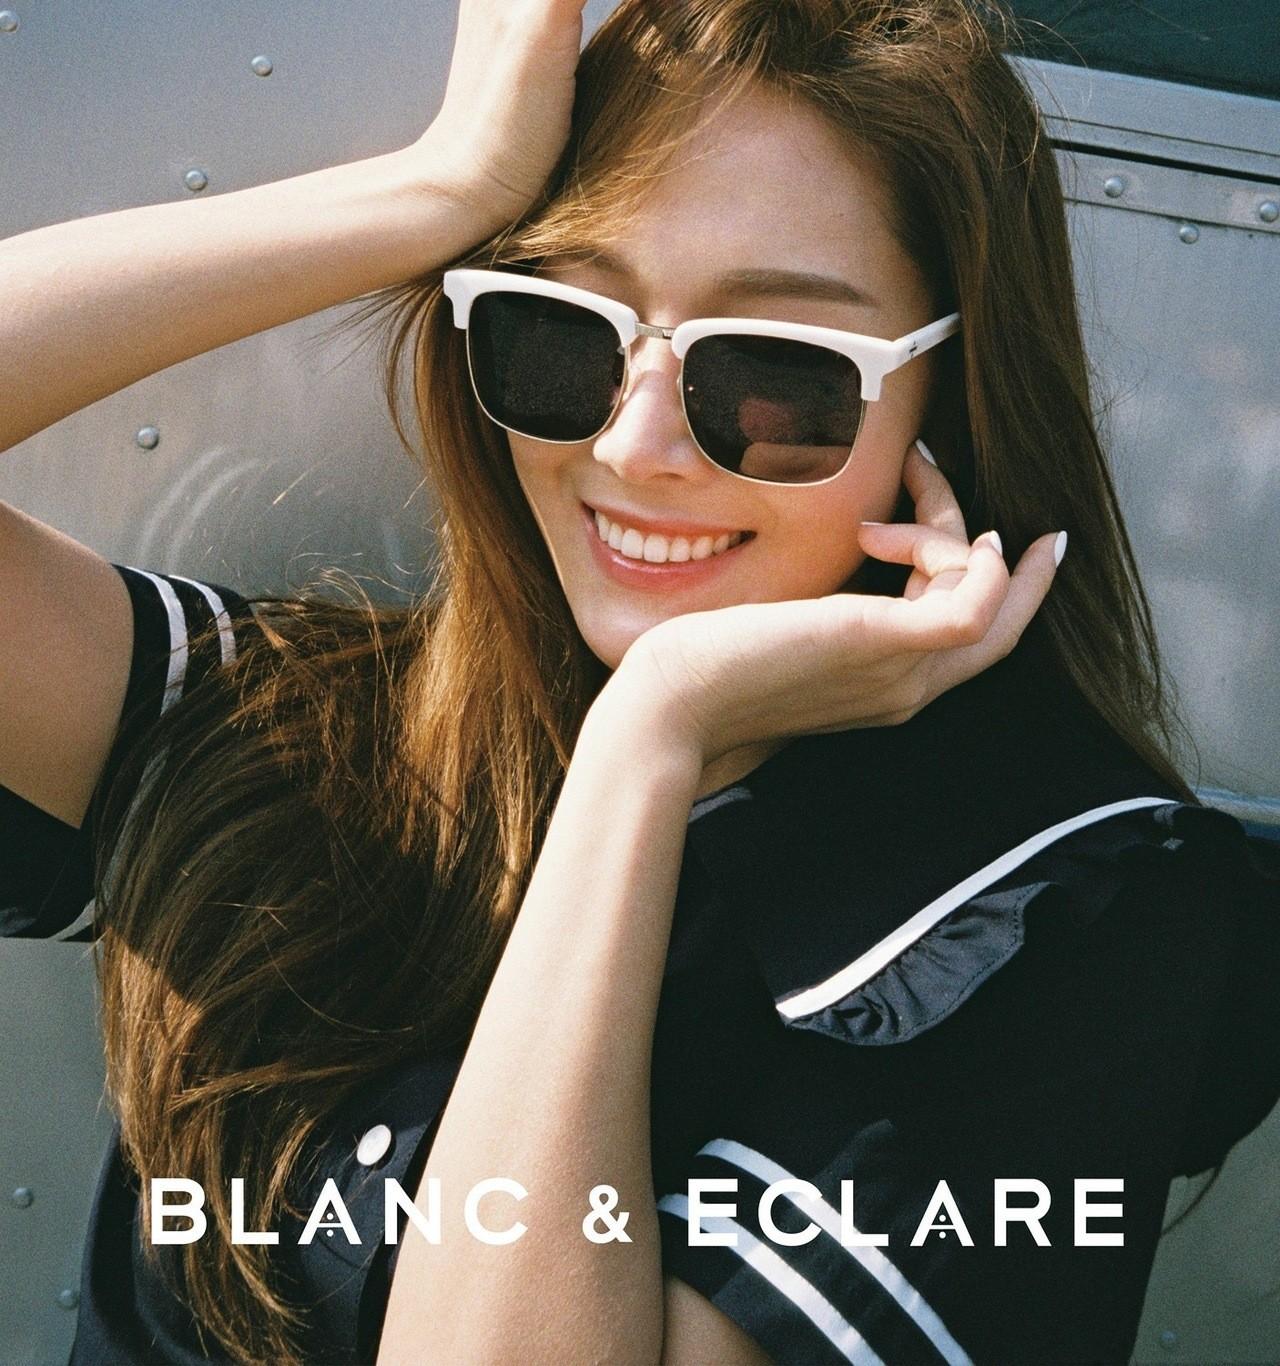 8-muon-co-cheap-moment-voi-idol-kpop-ban-nen-sam-nhung-thu-nay